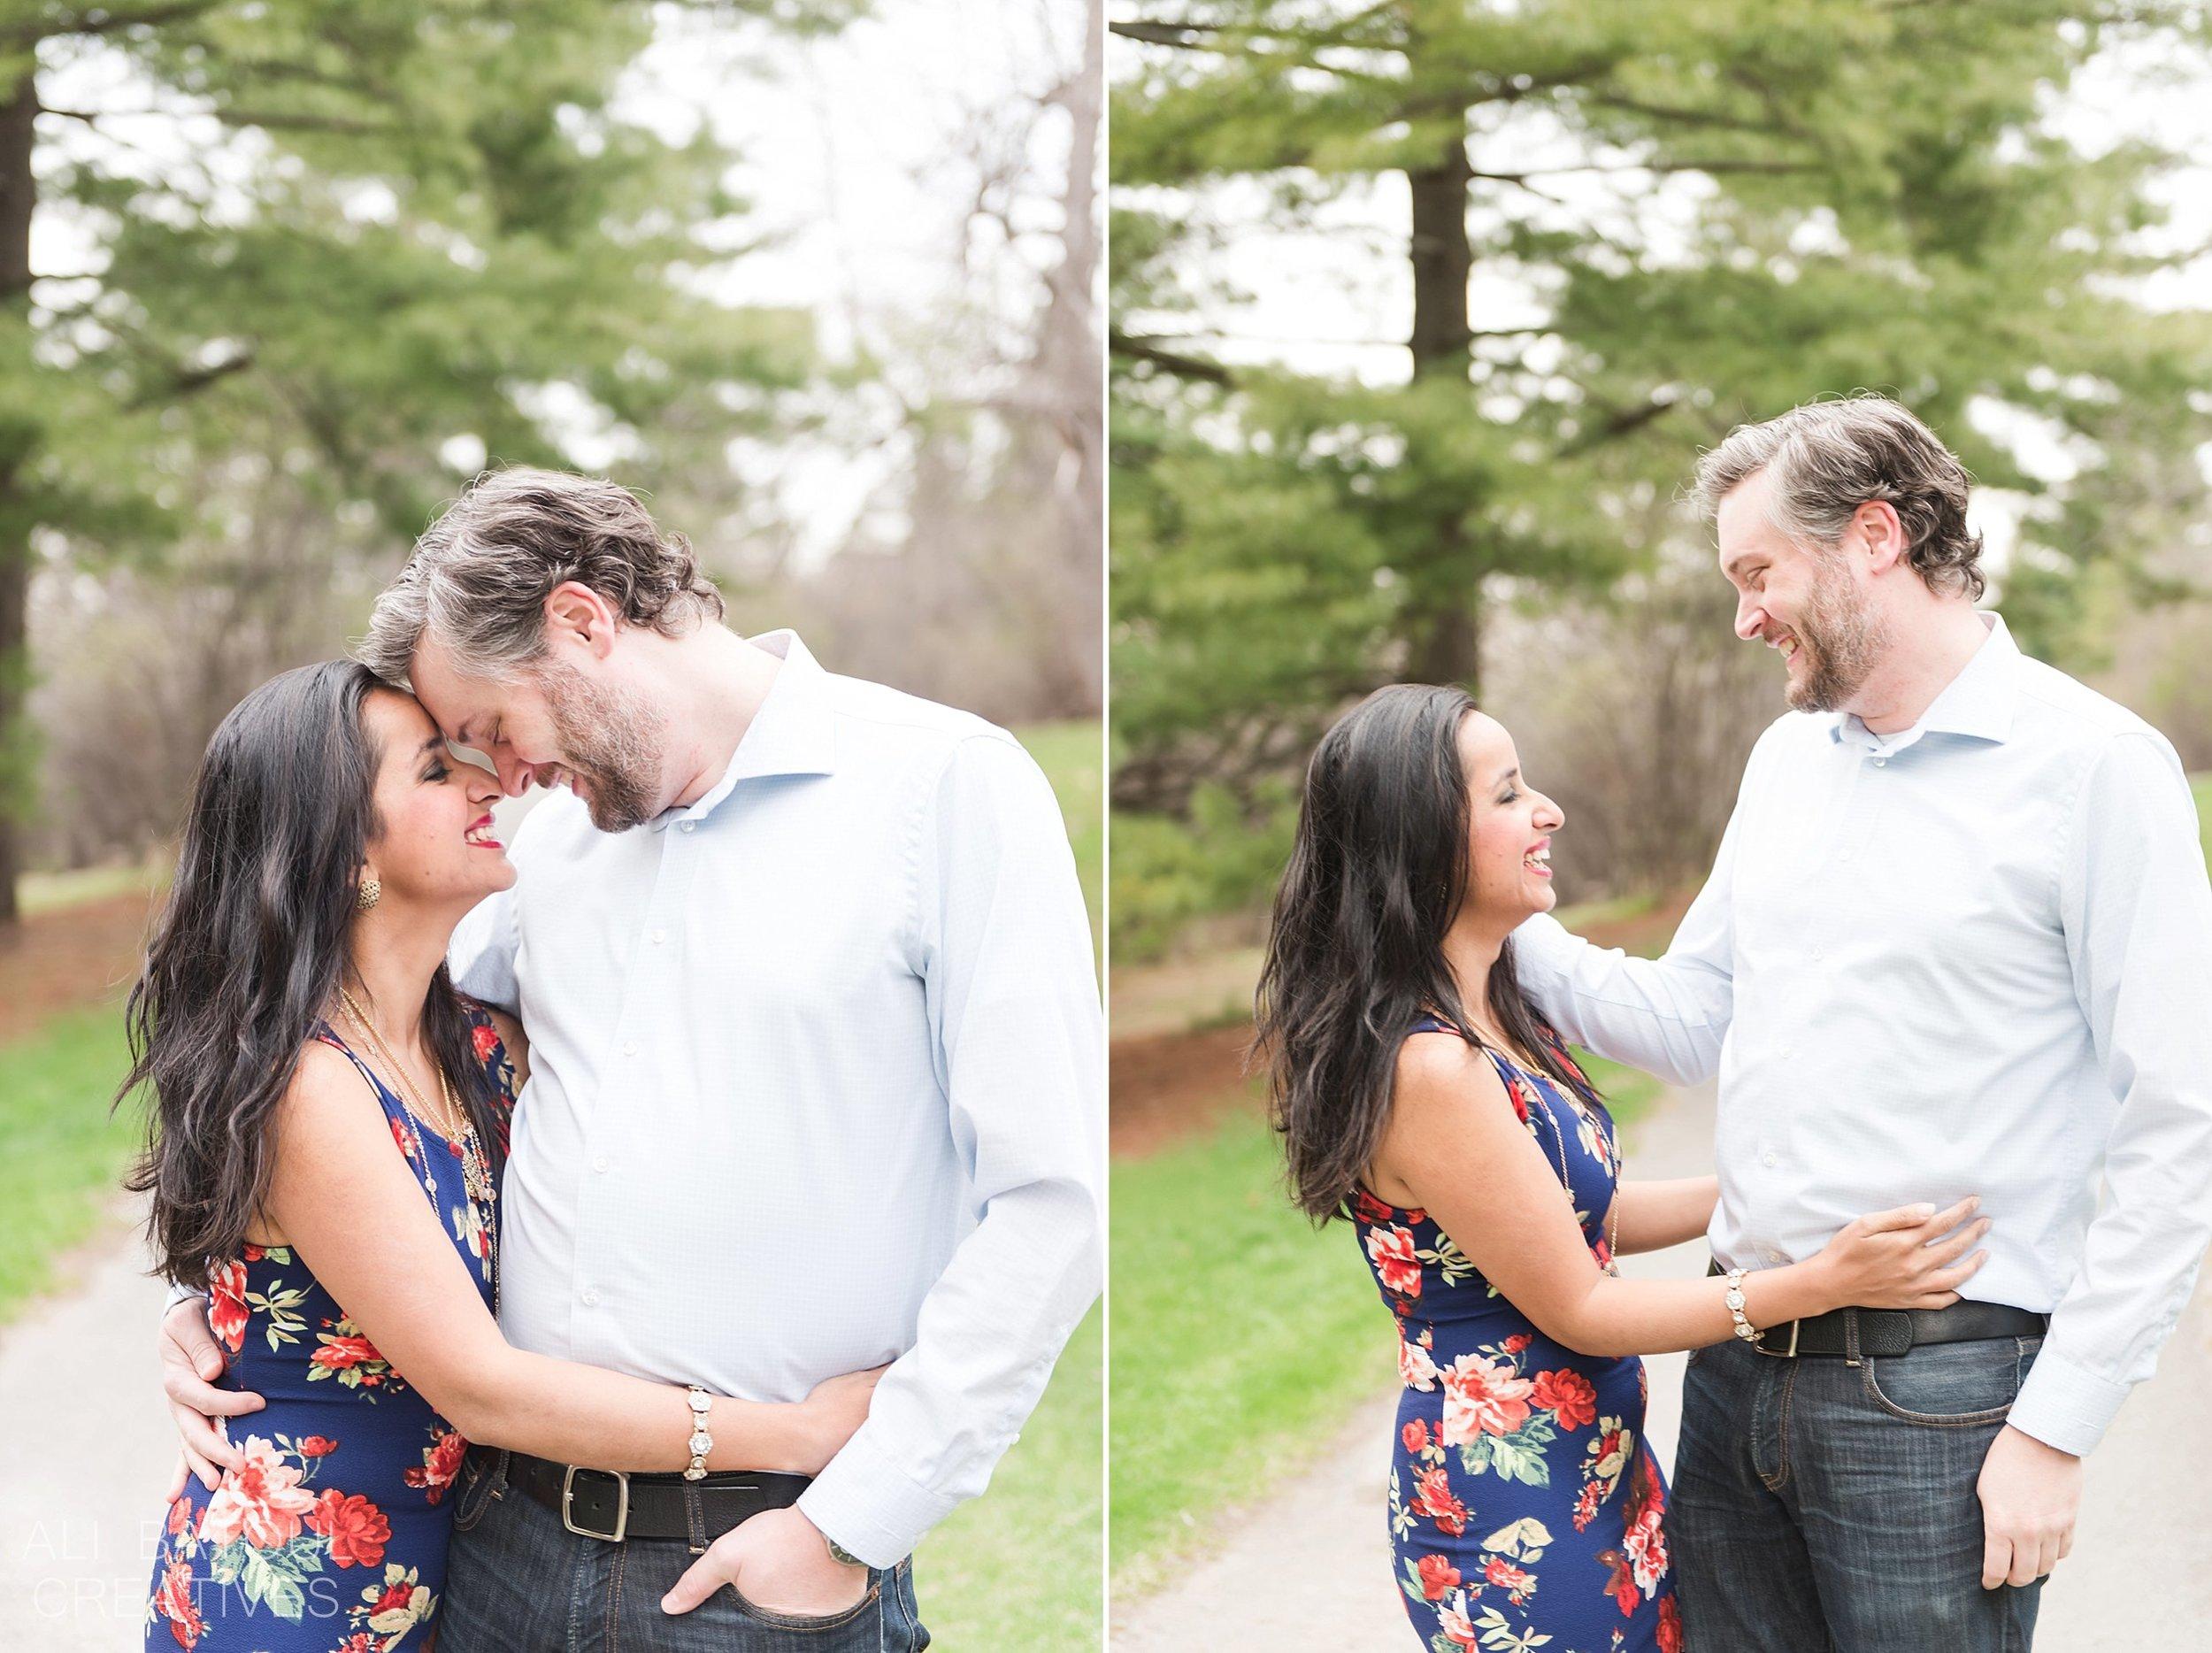 Uzma + Ian Engagement - Ali Batoul Creatives Fine Art Wedding Photography_0193.jpg